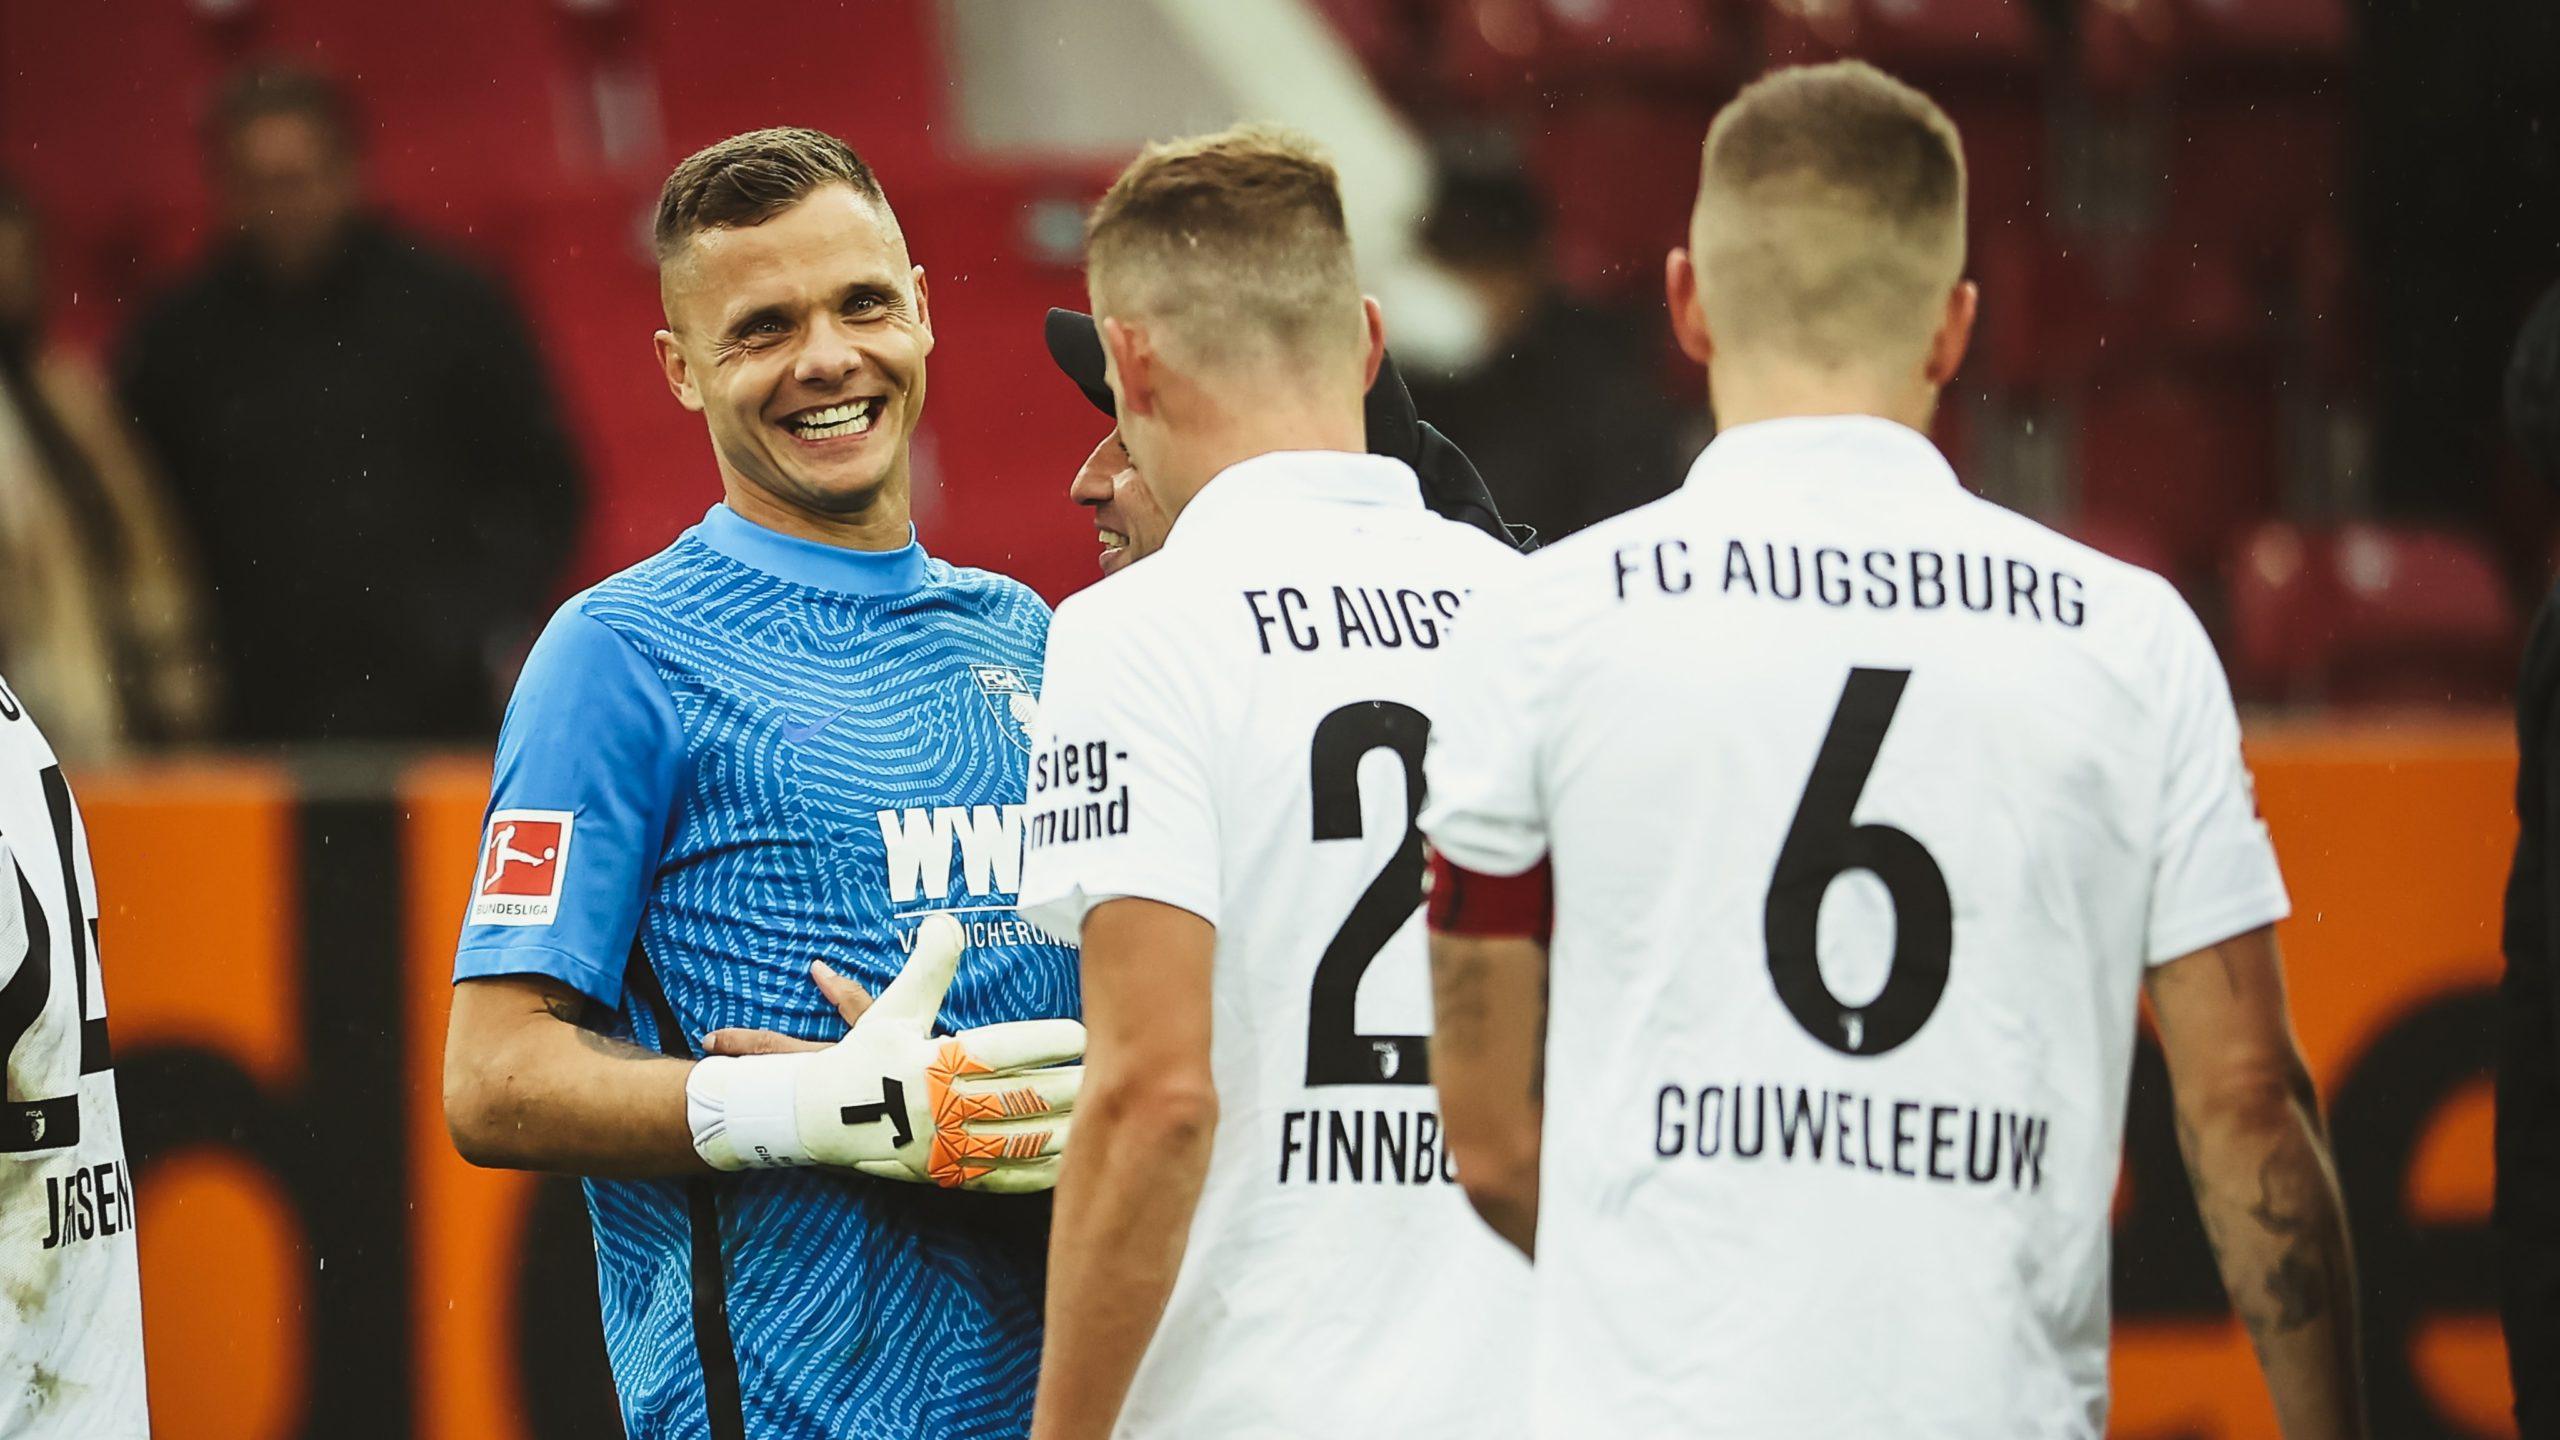 Bundesliga Preview 2020/21: Matchday 3